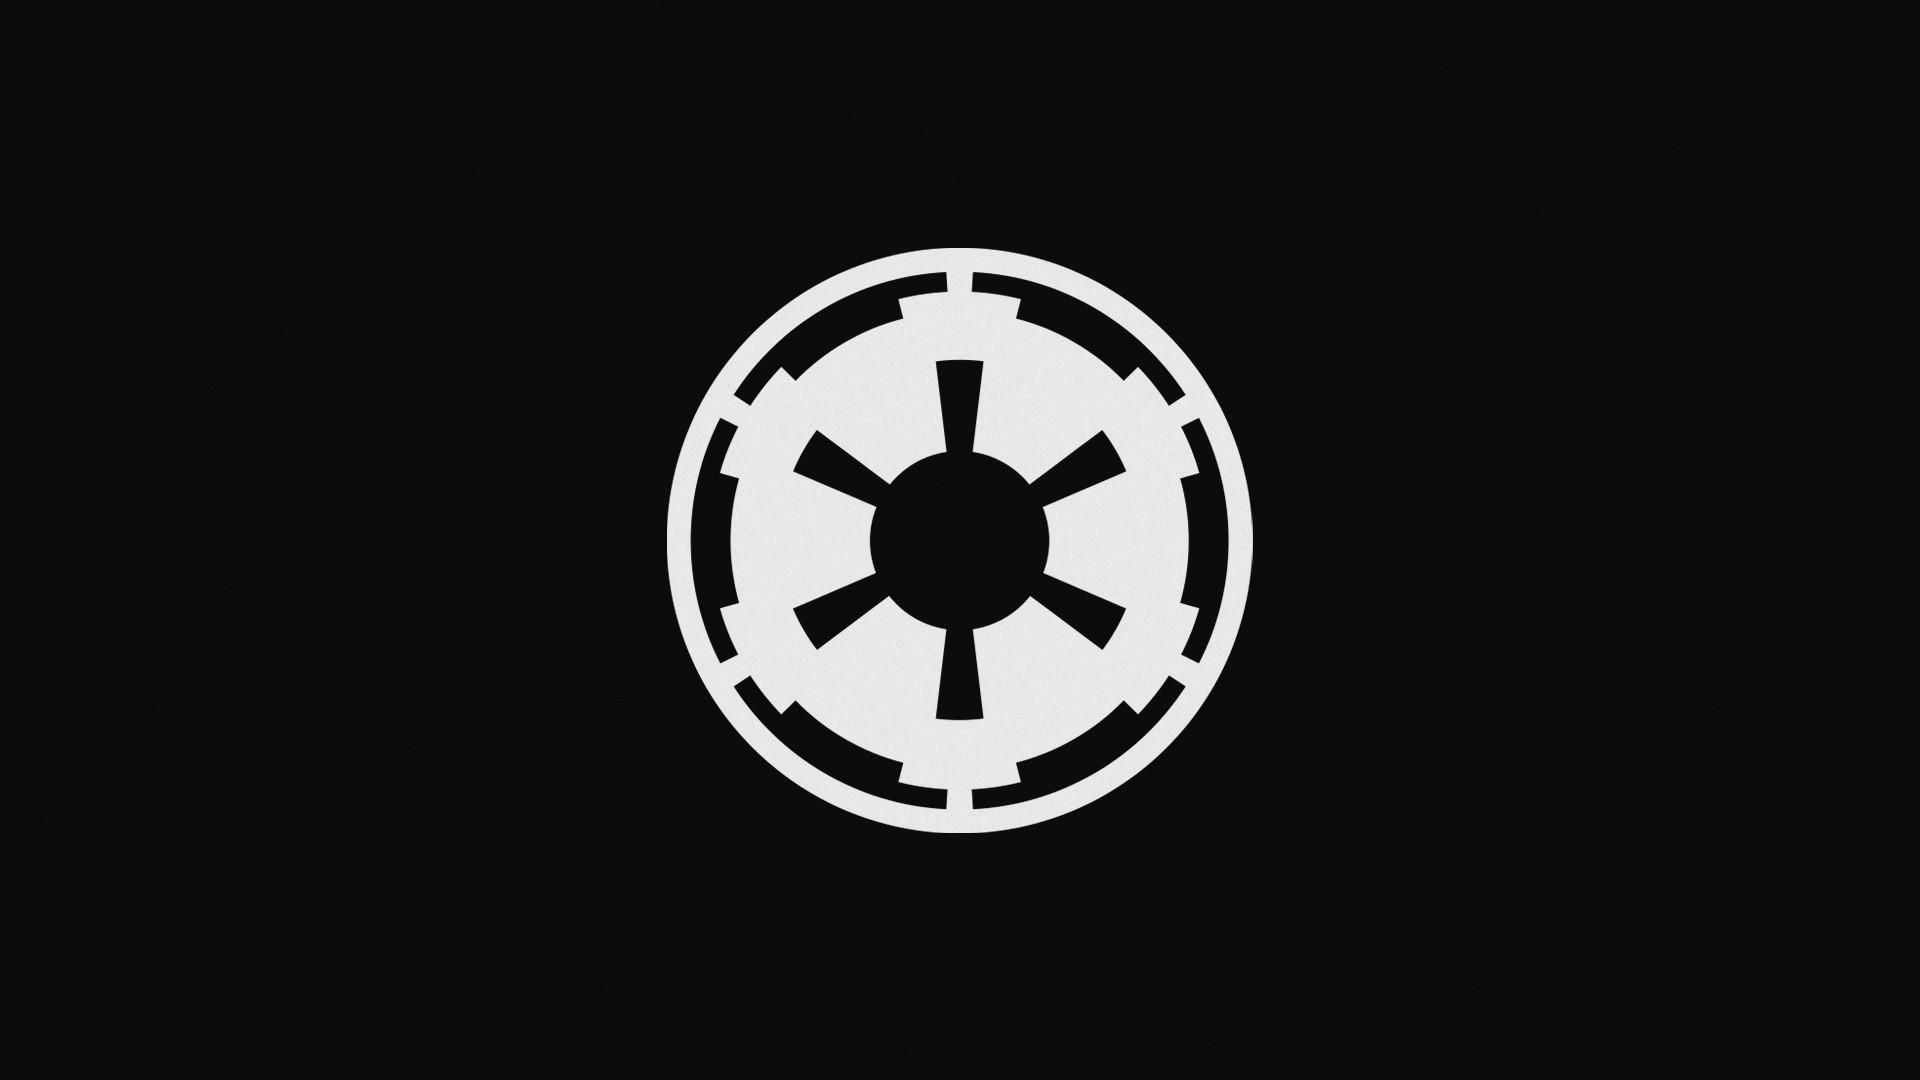 Galactic Empire Wallpaper